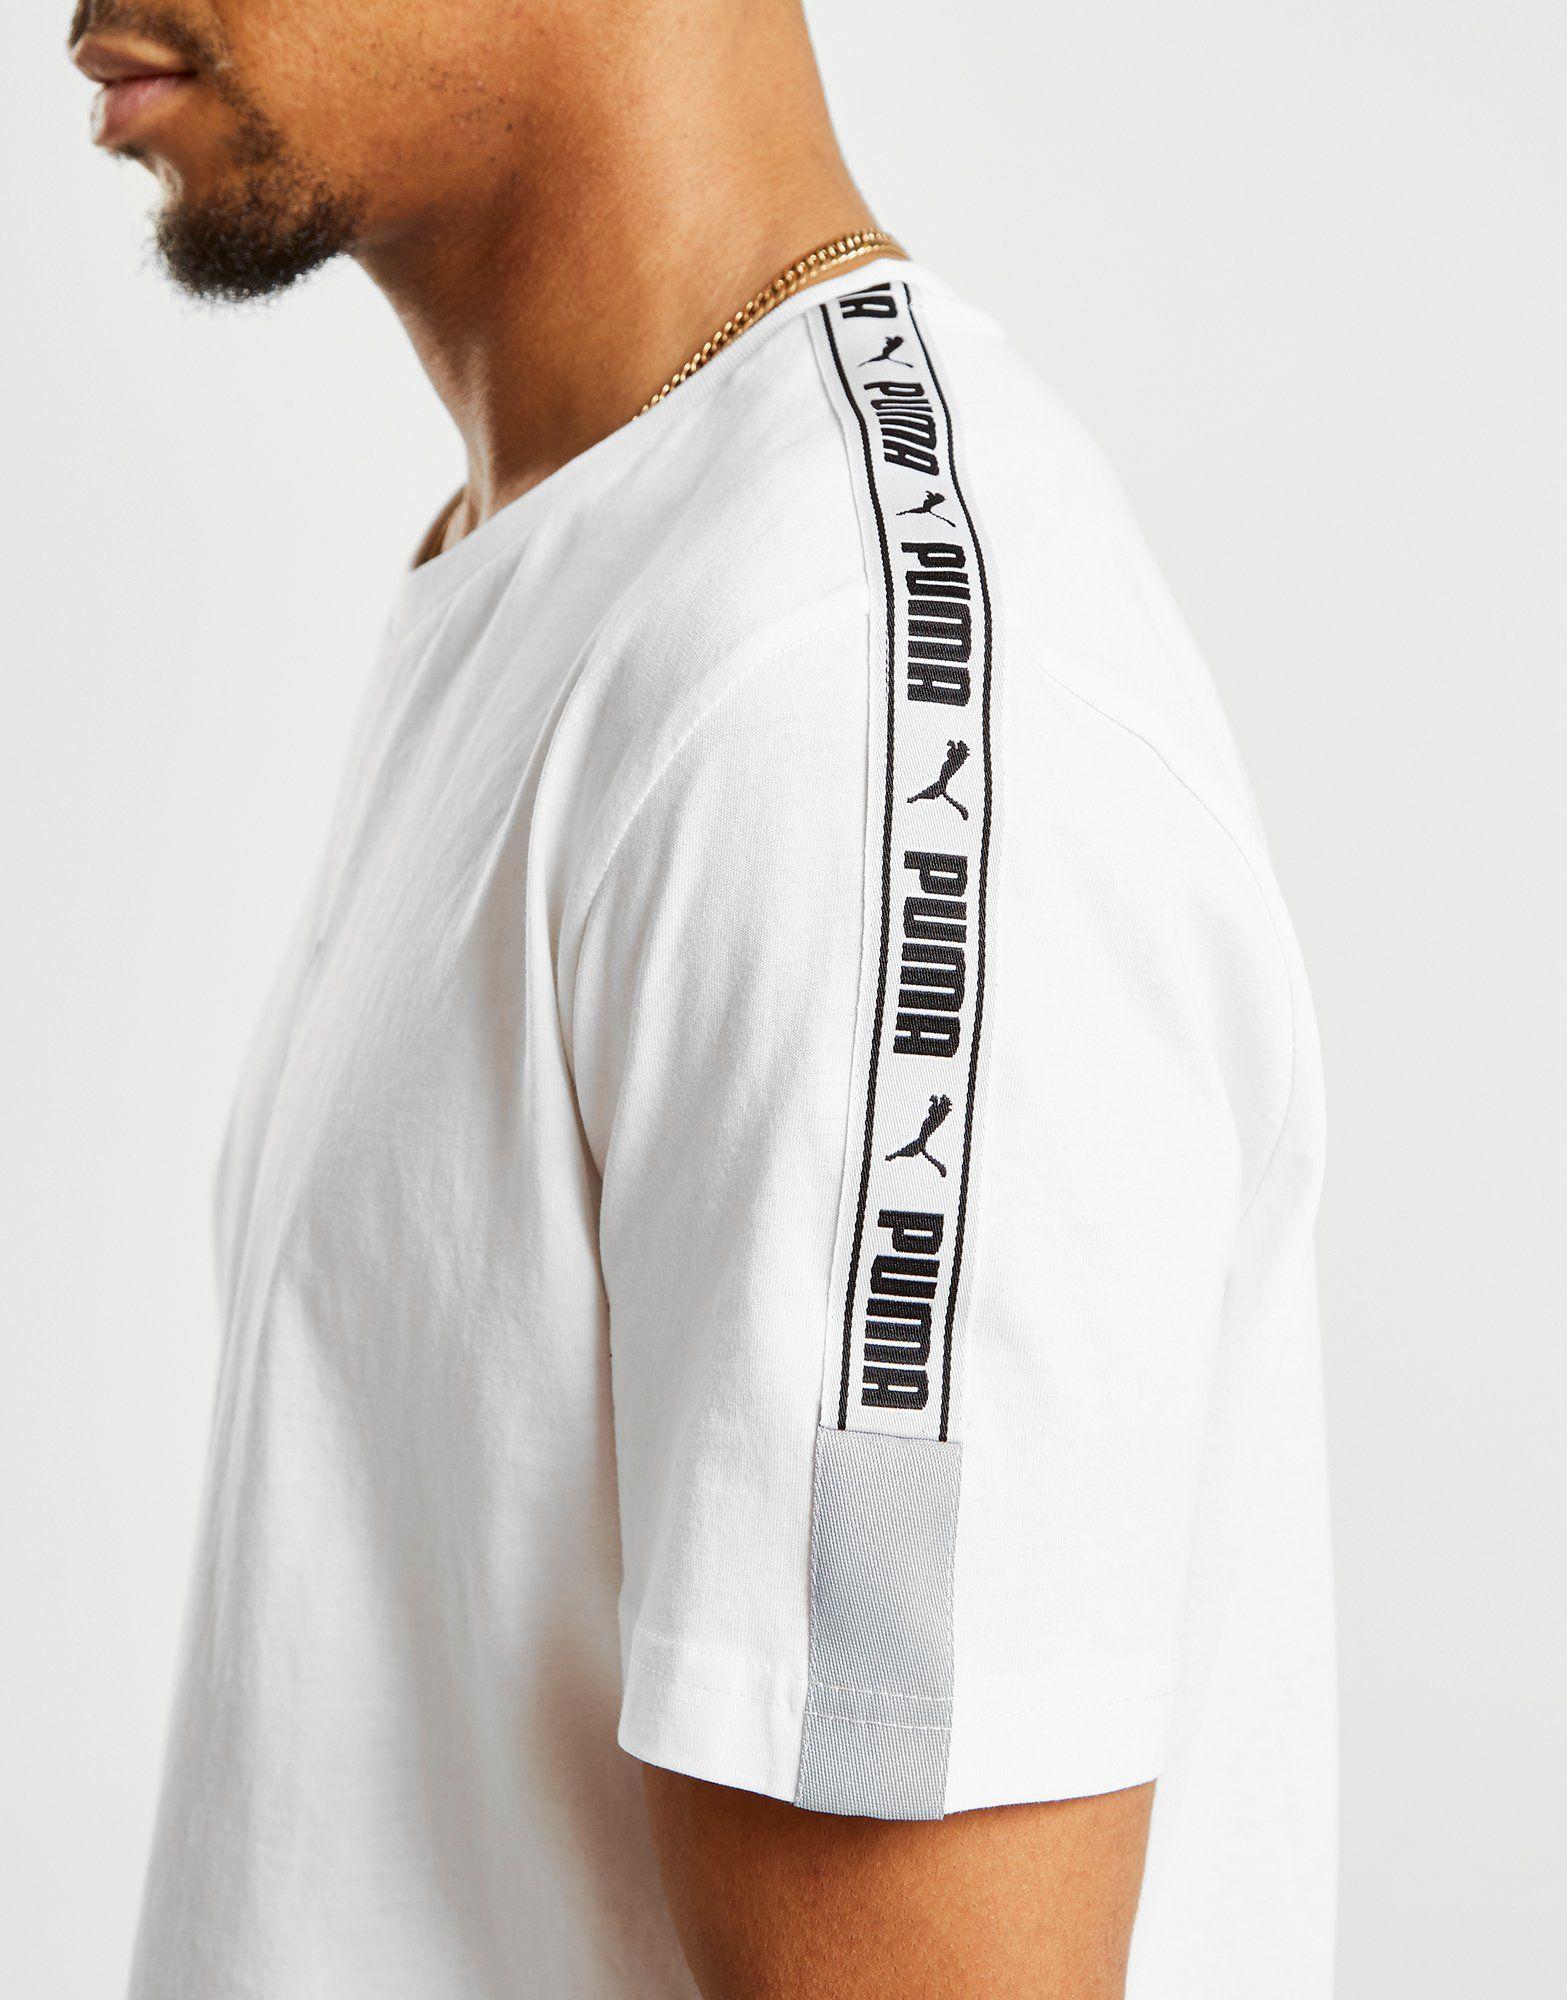 PUMA XTG Tape T-Shirt